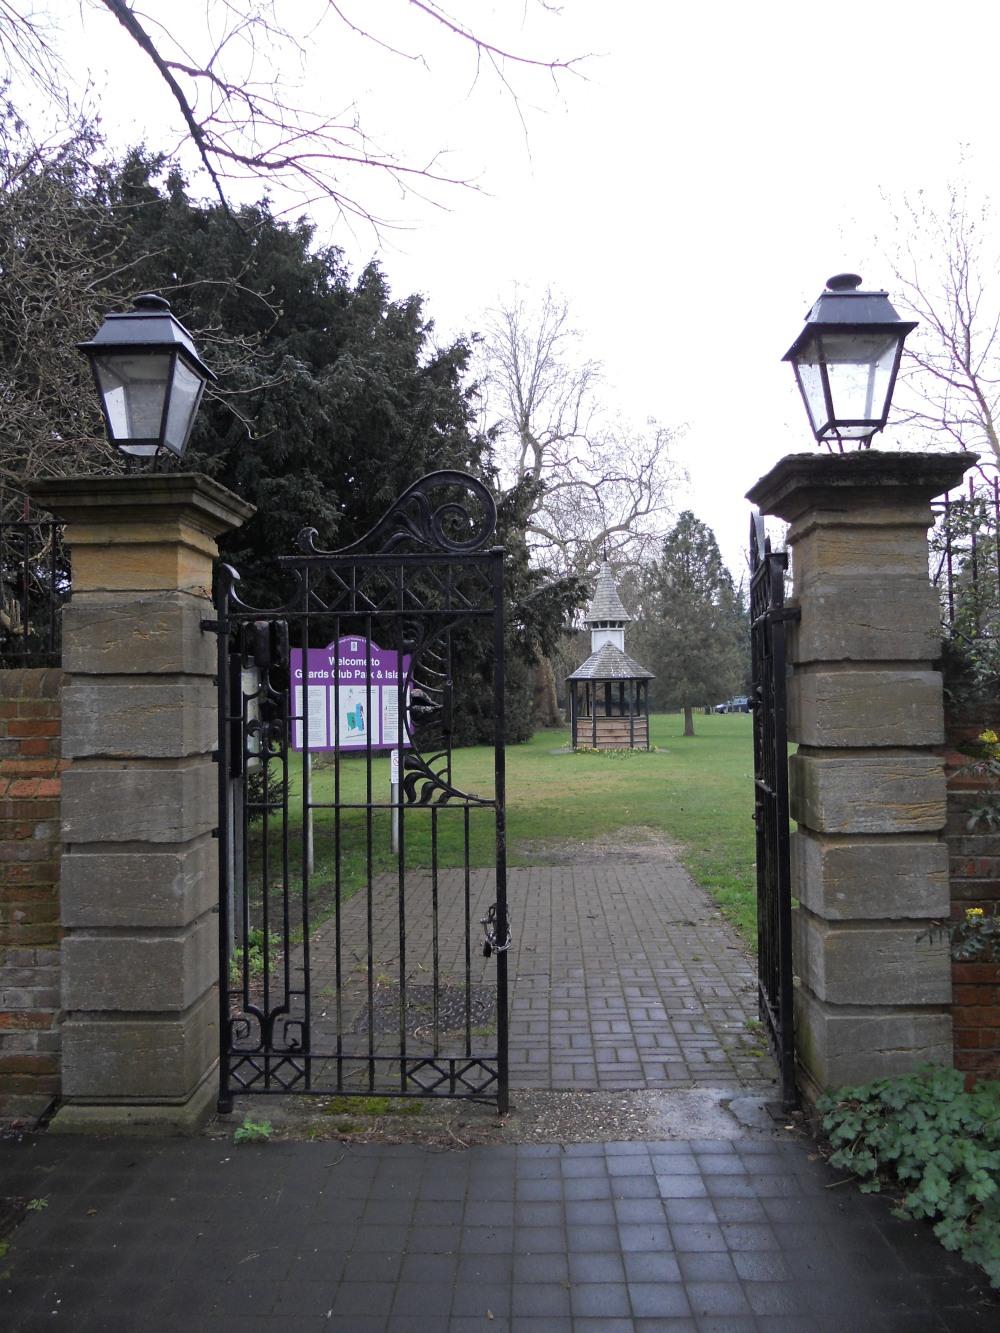 Entrance to Guards Club Park